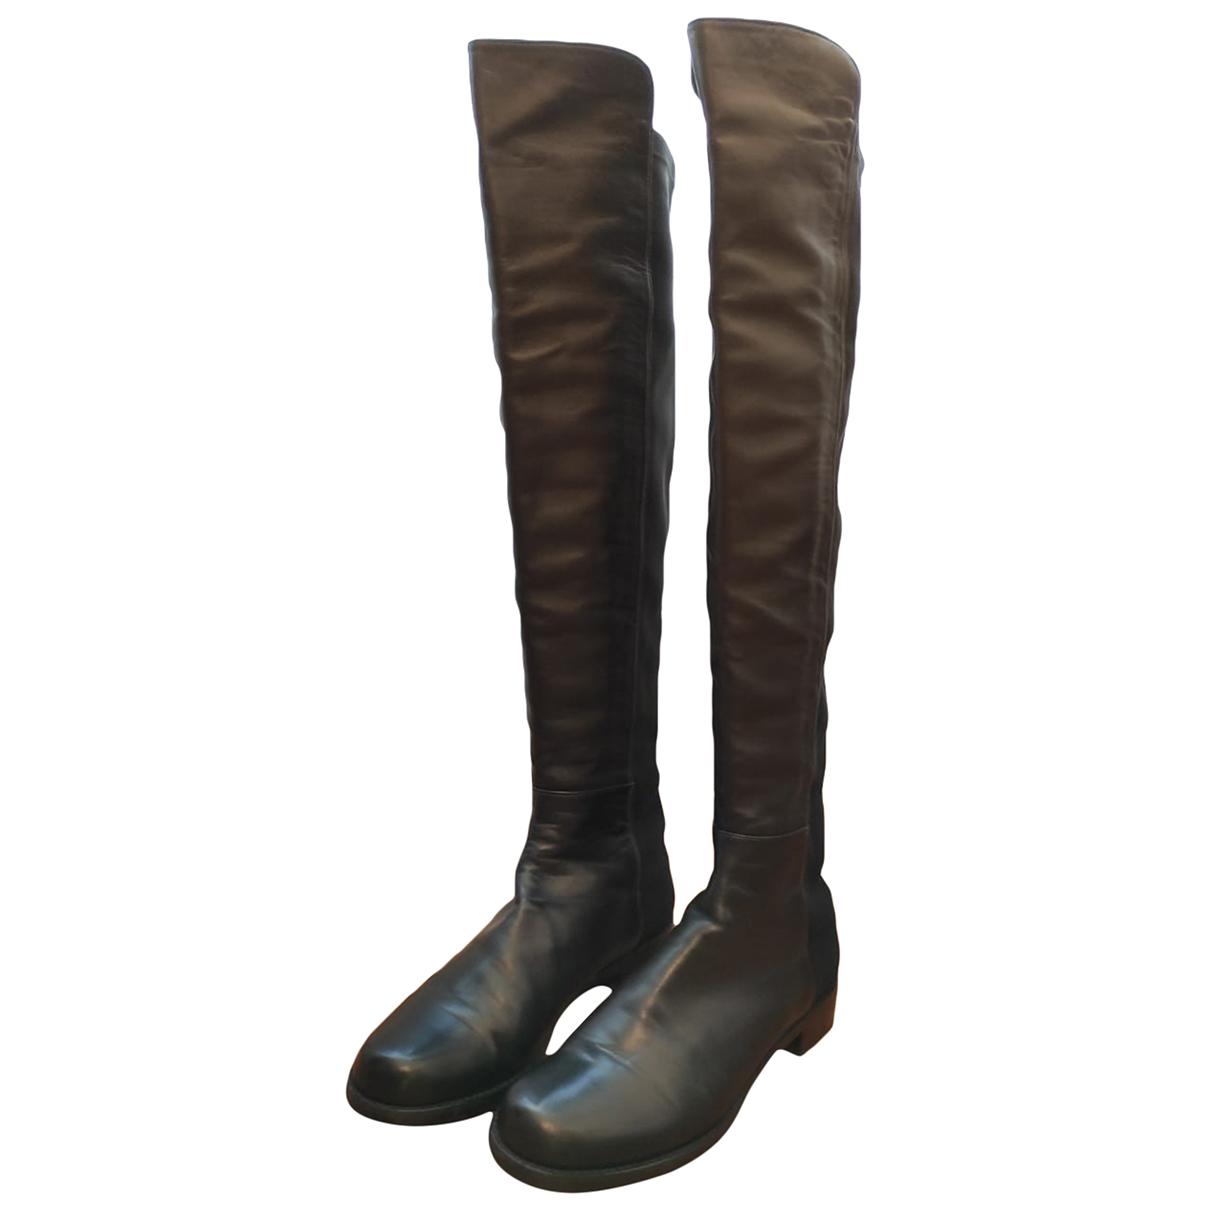 Botas altas de Cuero Stuart Weitzman